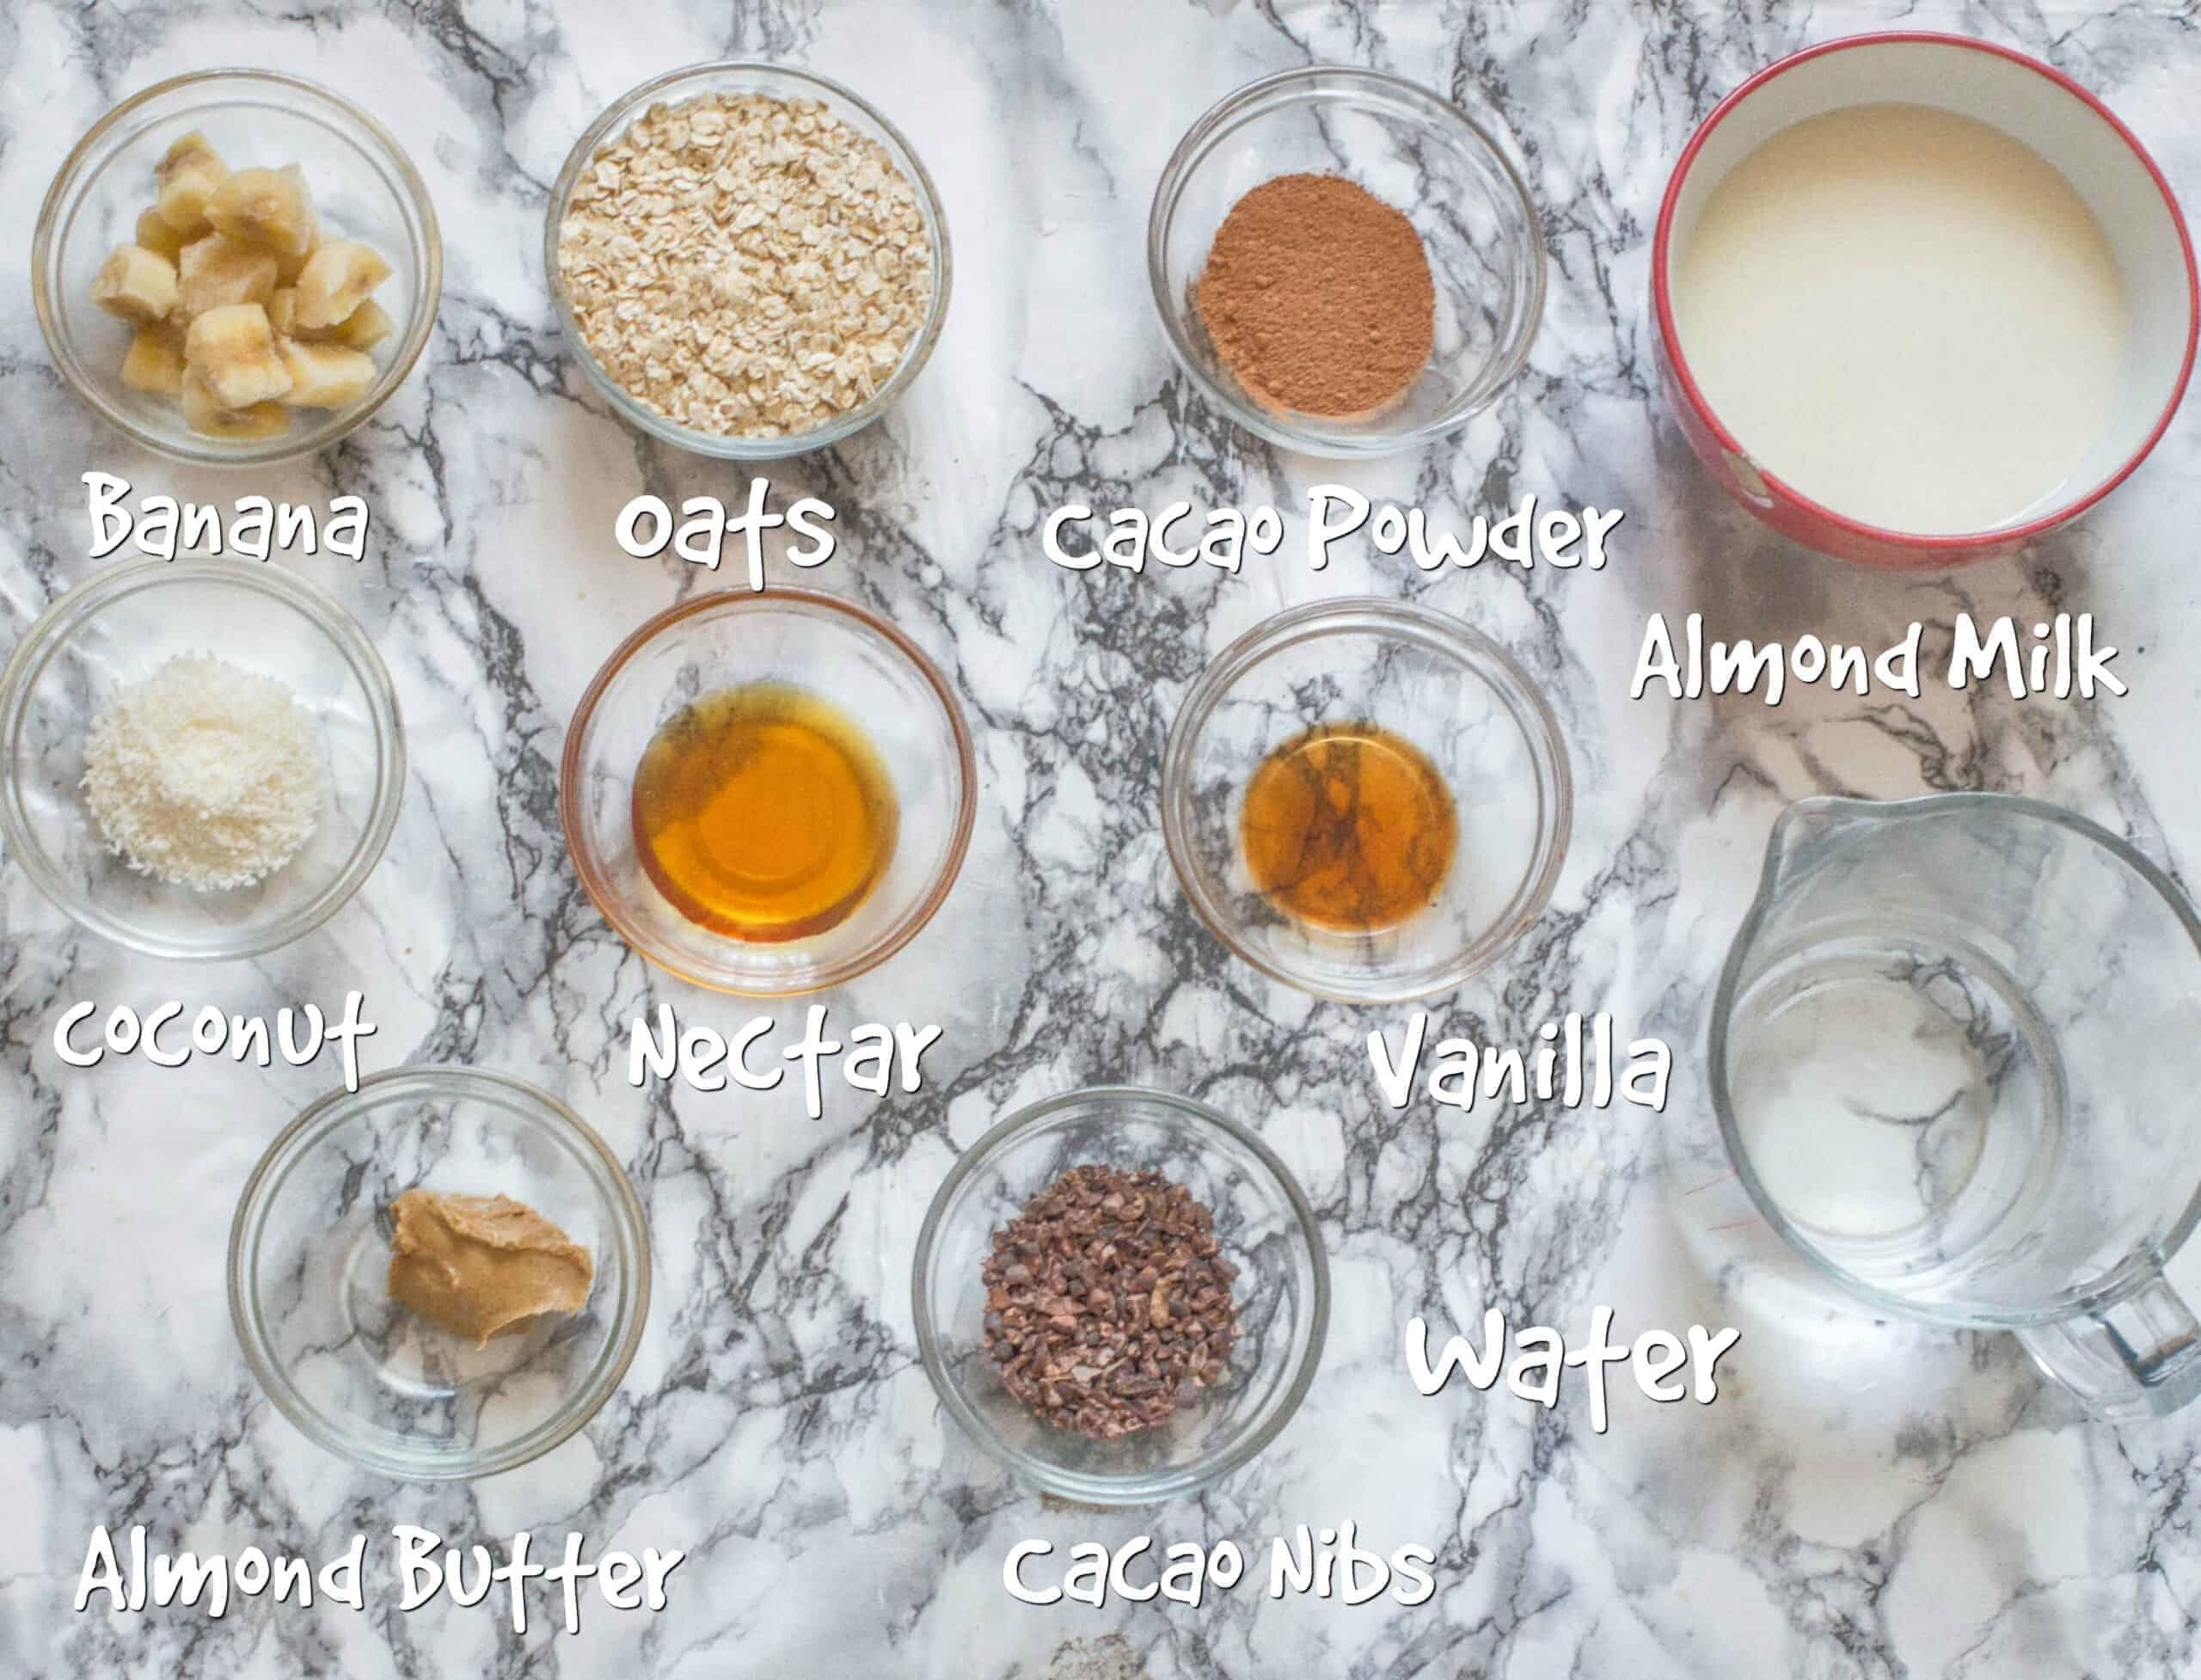 ingredients for chocolate coconut porridge